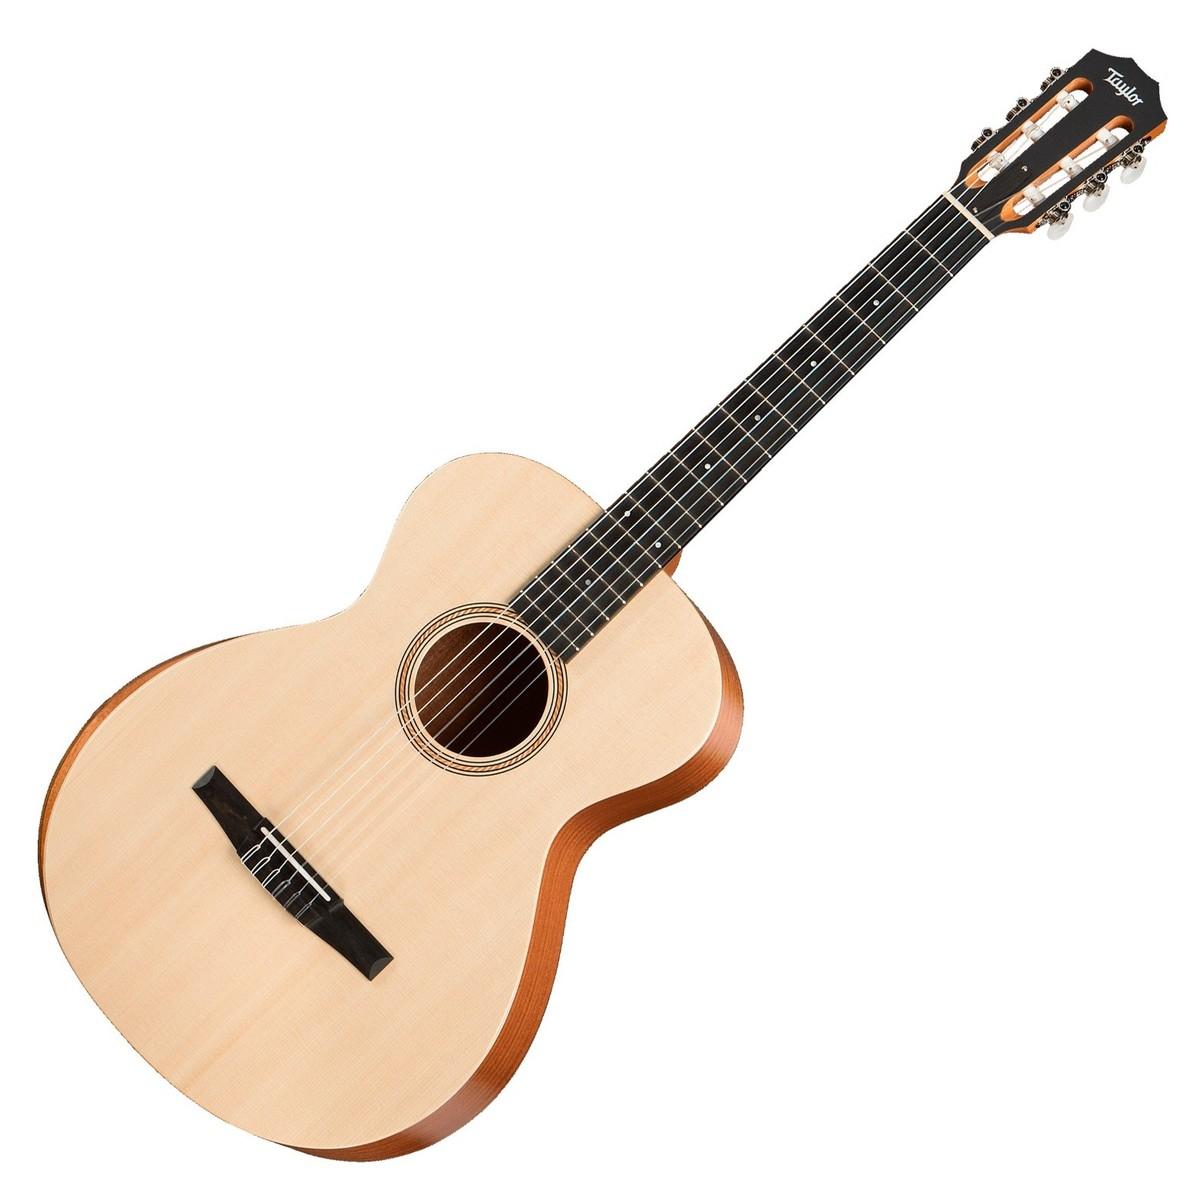 taylor academy a12e n electro classical nylon guitar guitar mania. Black Bedroom Furniture Sets. Home Design Ideas